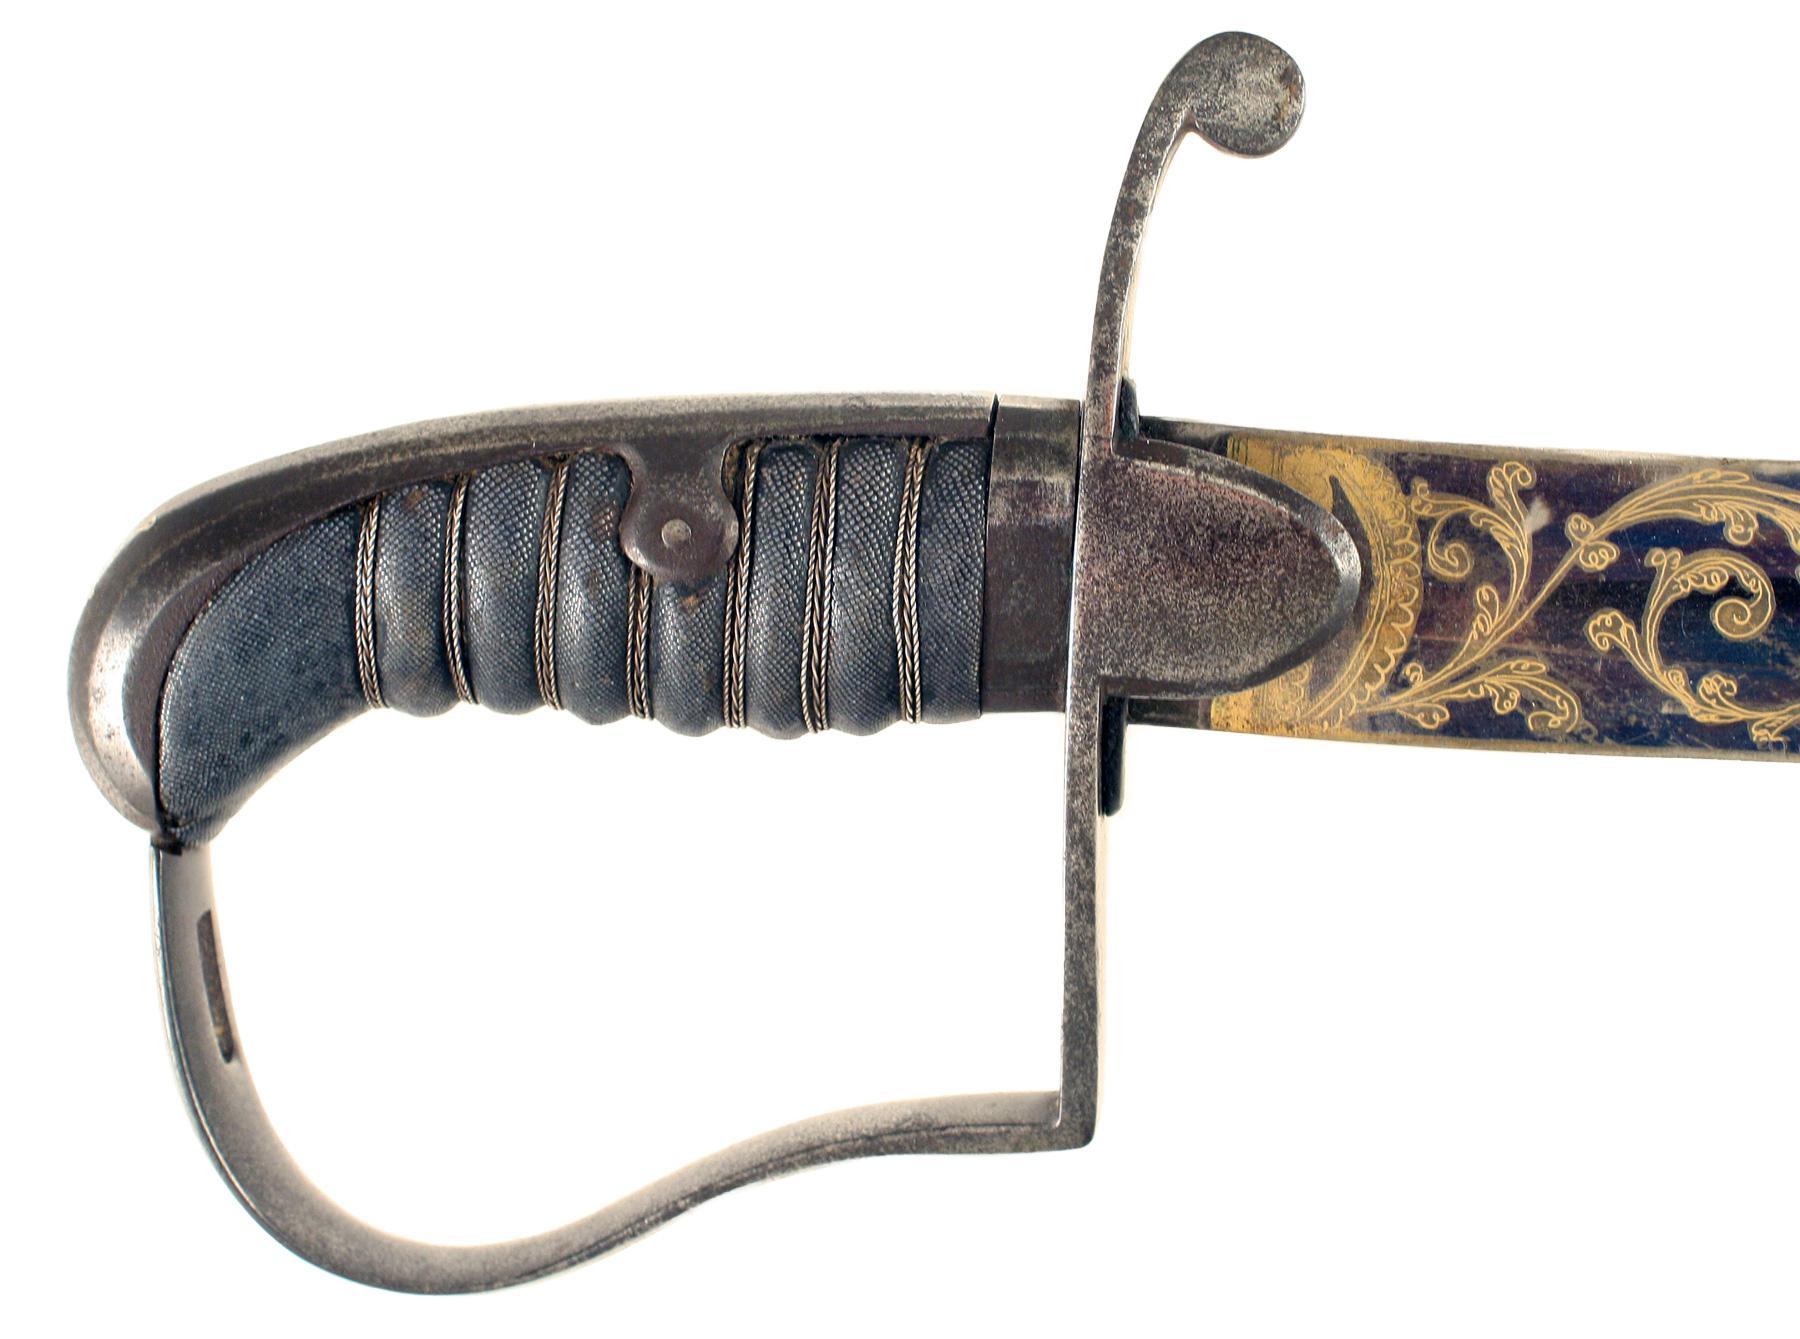 A 1796 Pattern Blue & Gilt Sword